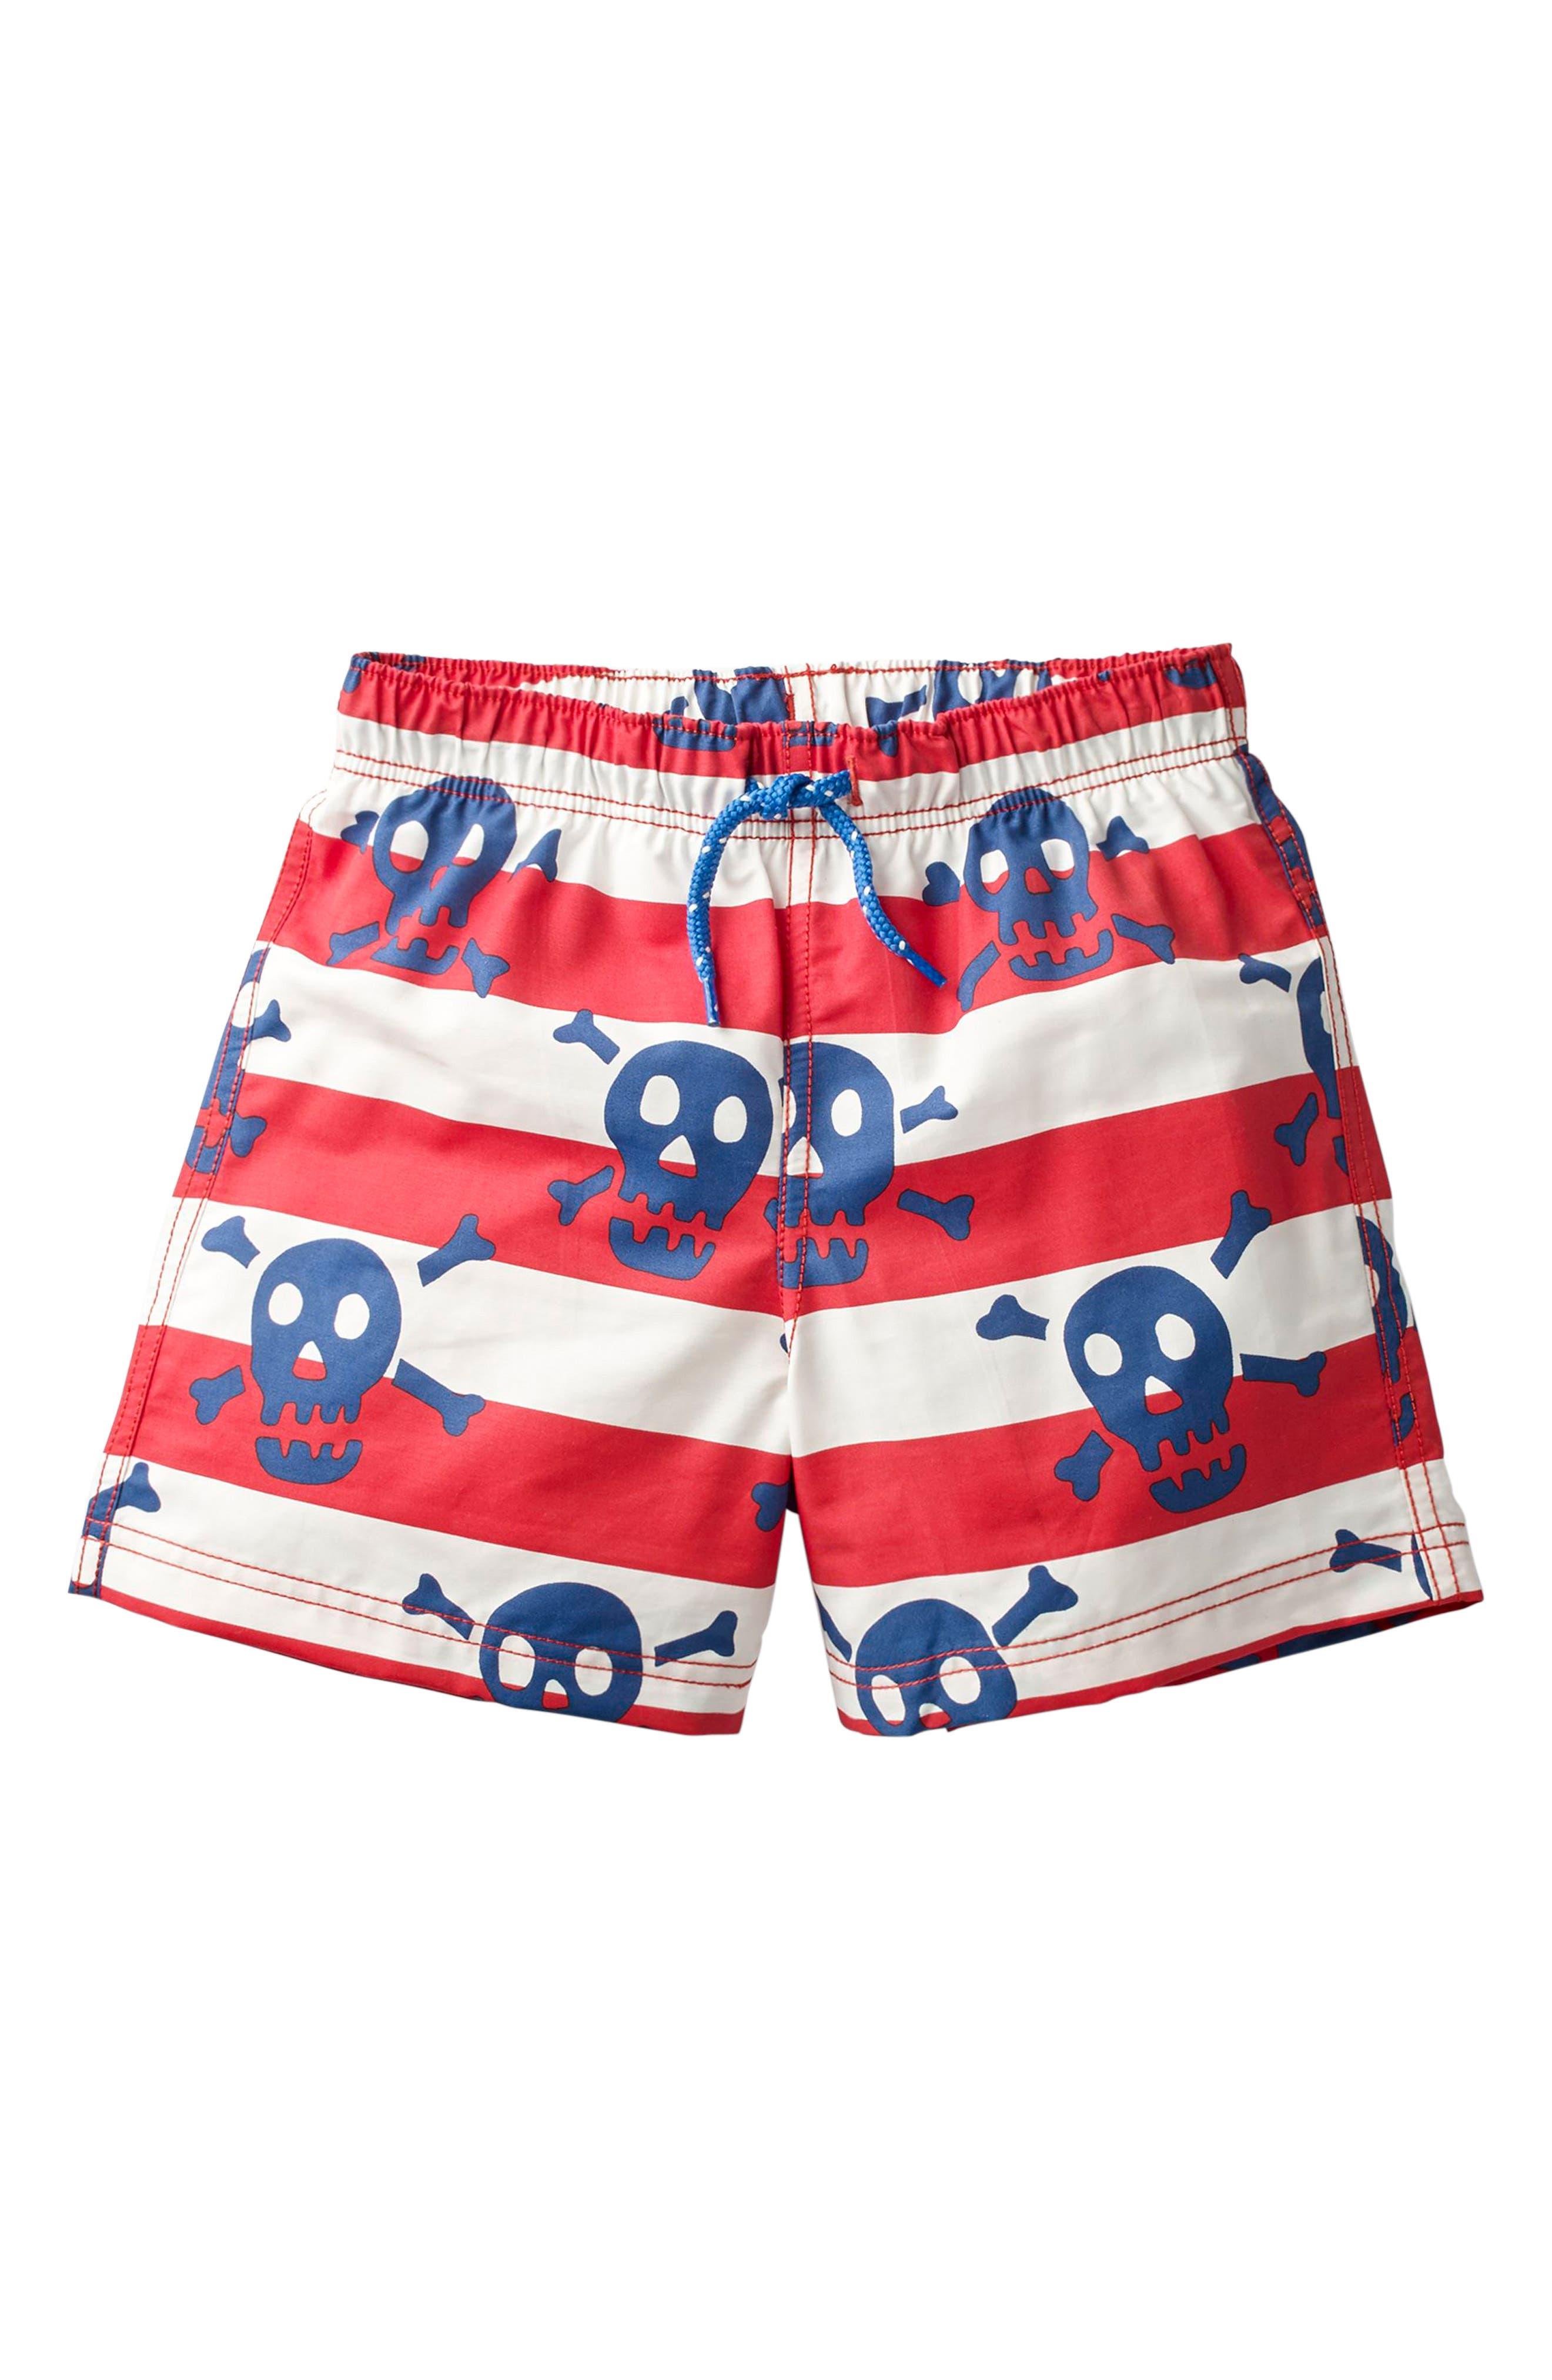 Mini Boden Bathers Skulls Swim Trunks (Toddler Boys, Little Boys & Big Boys)